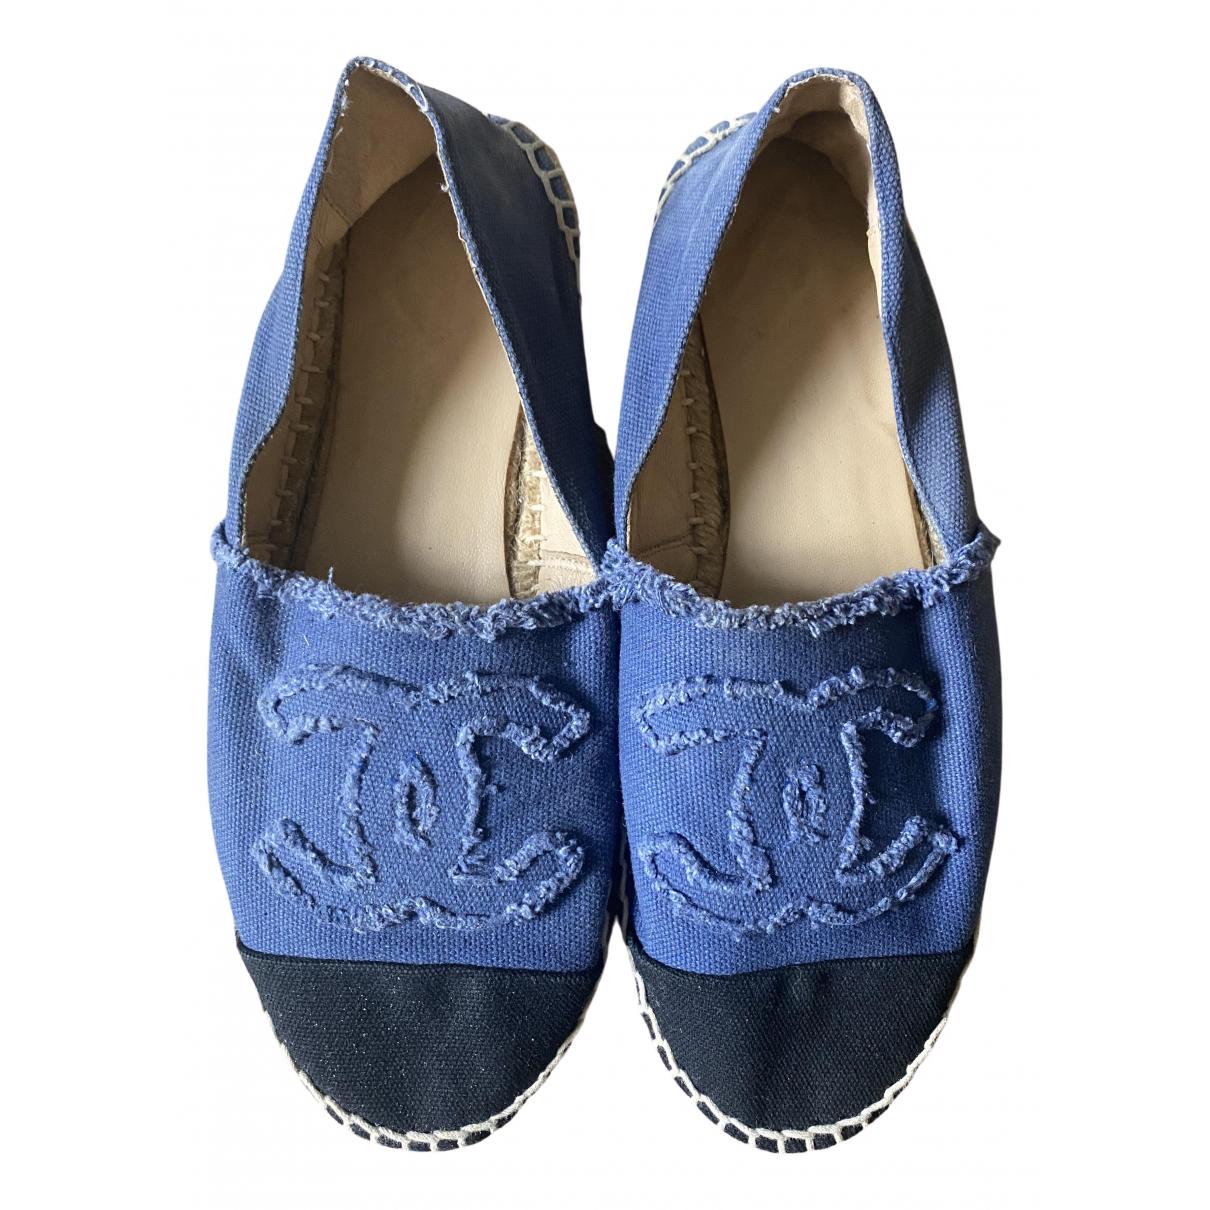 Chanel \N Espadrilles in  Blau Leinen